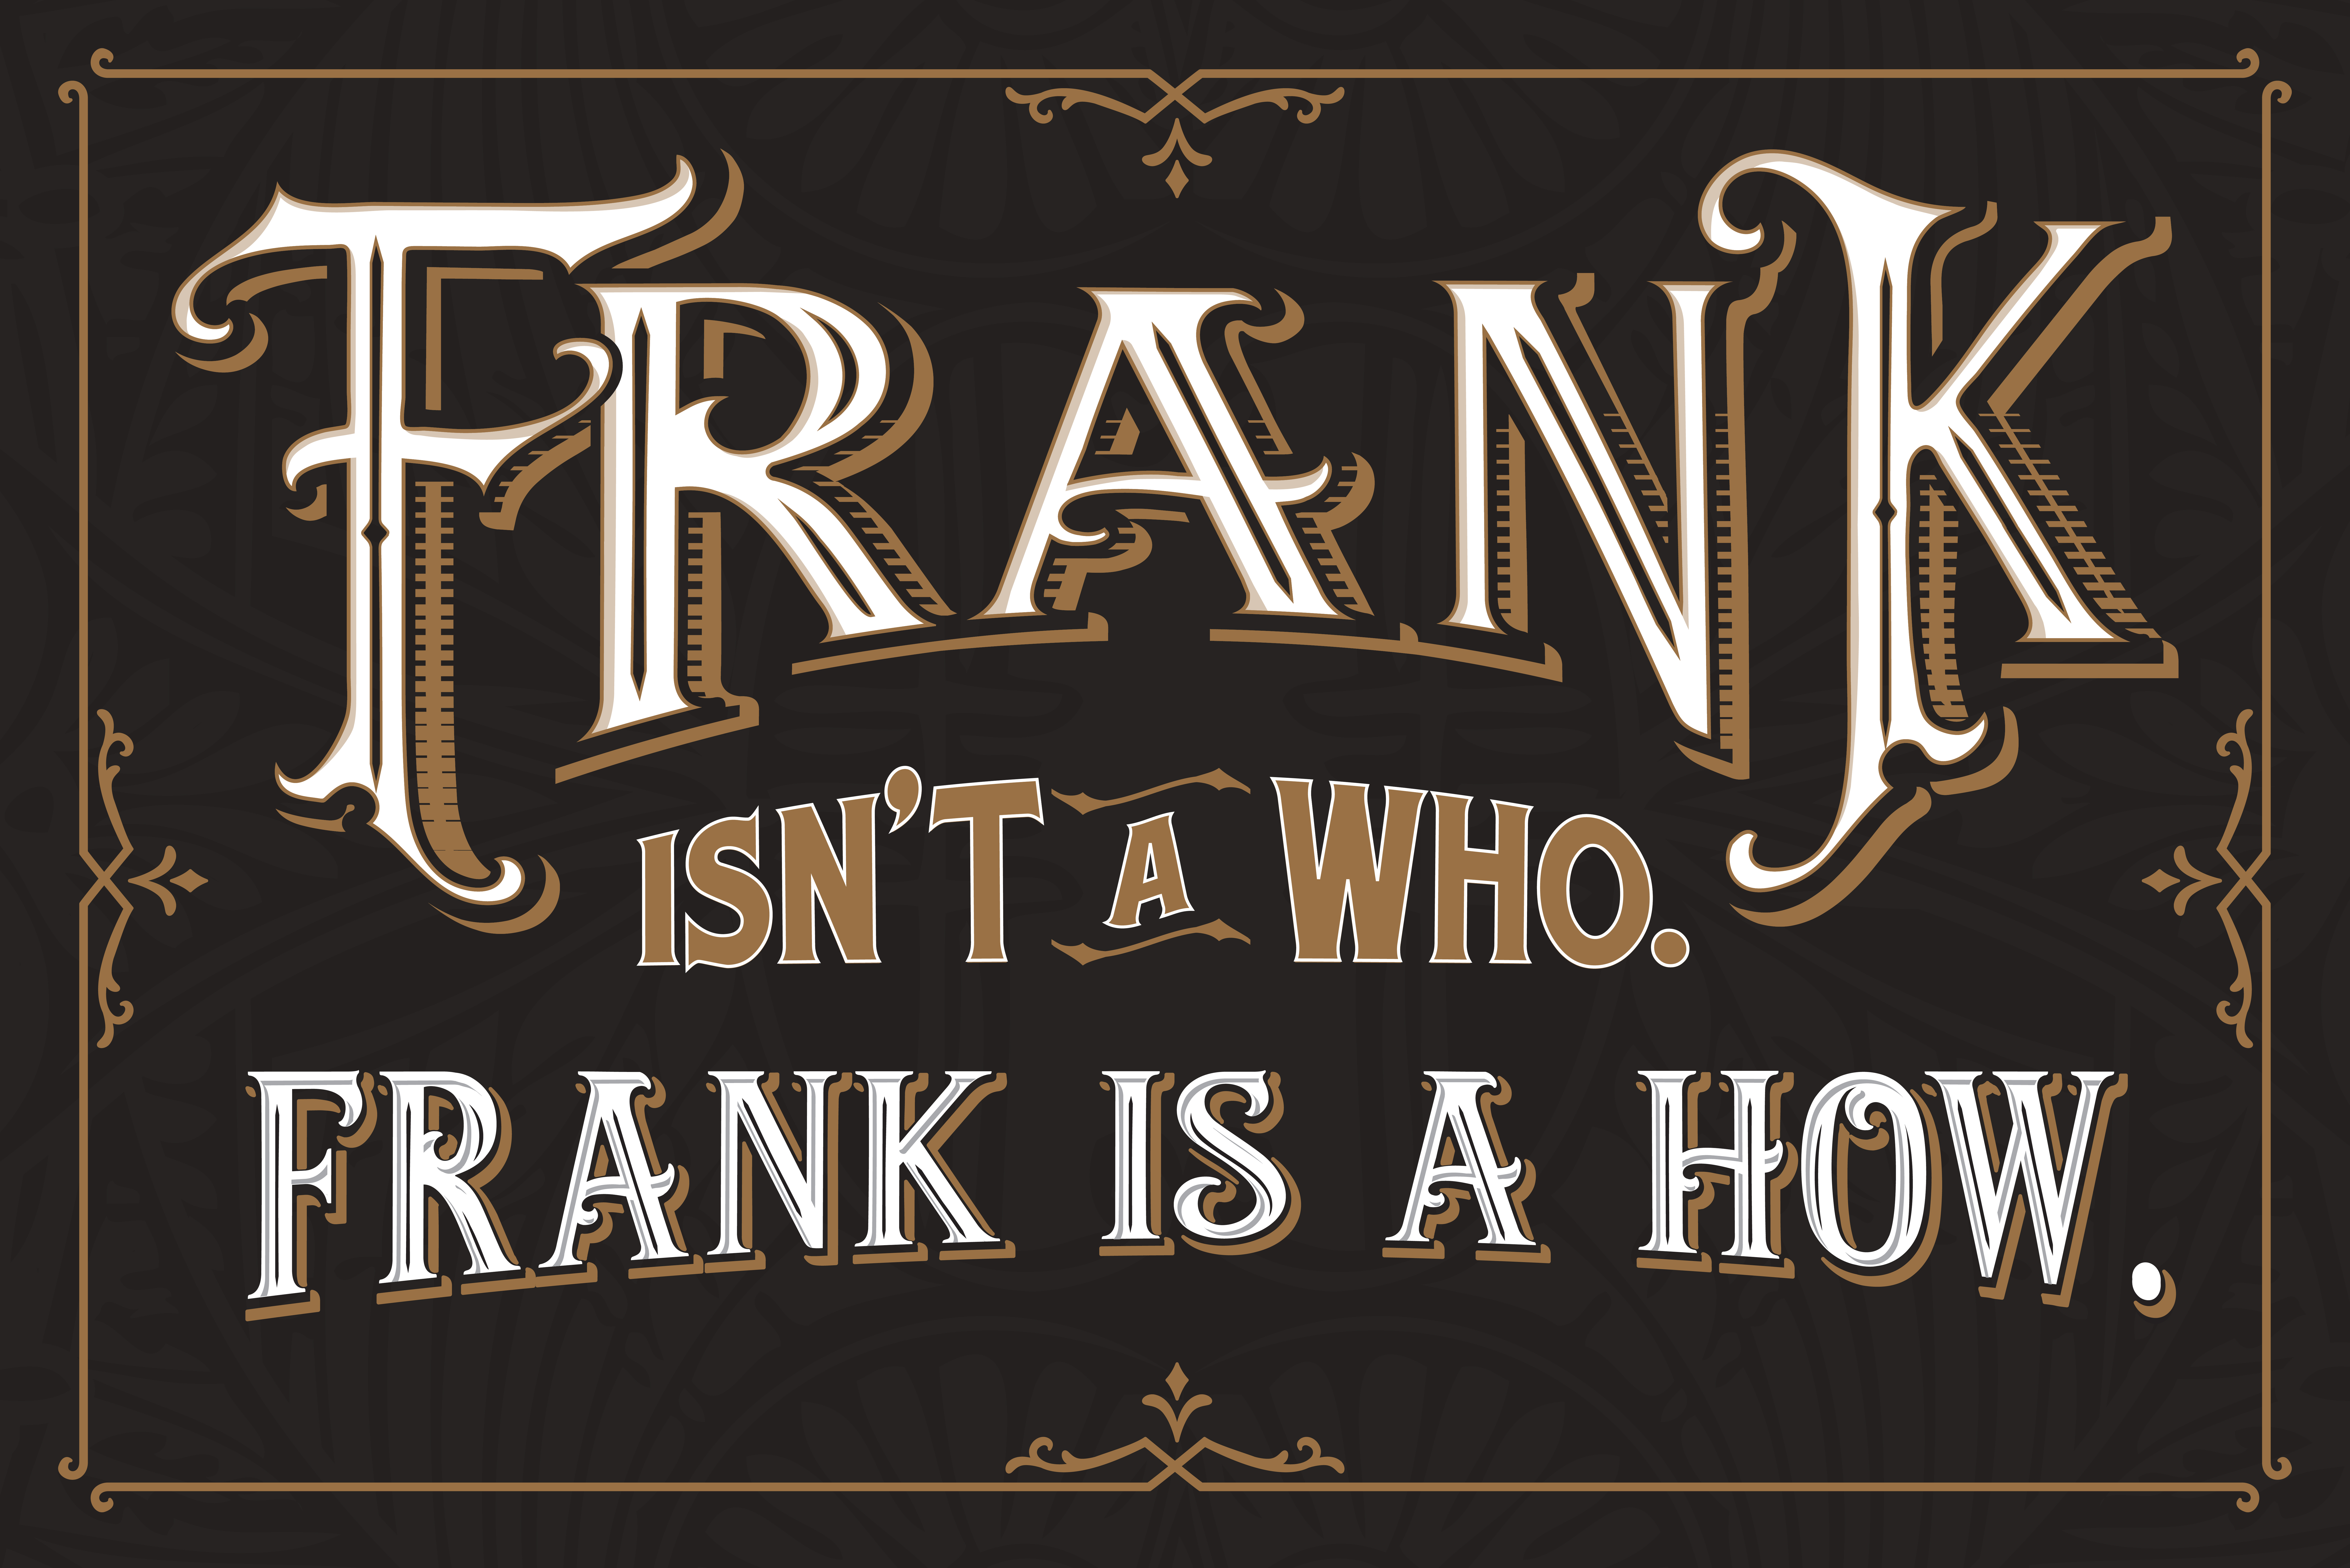 Frankism_1_Artboard 1.jpg